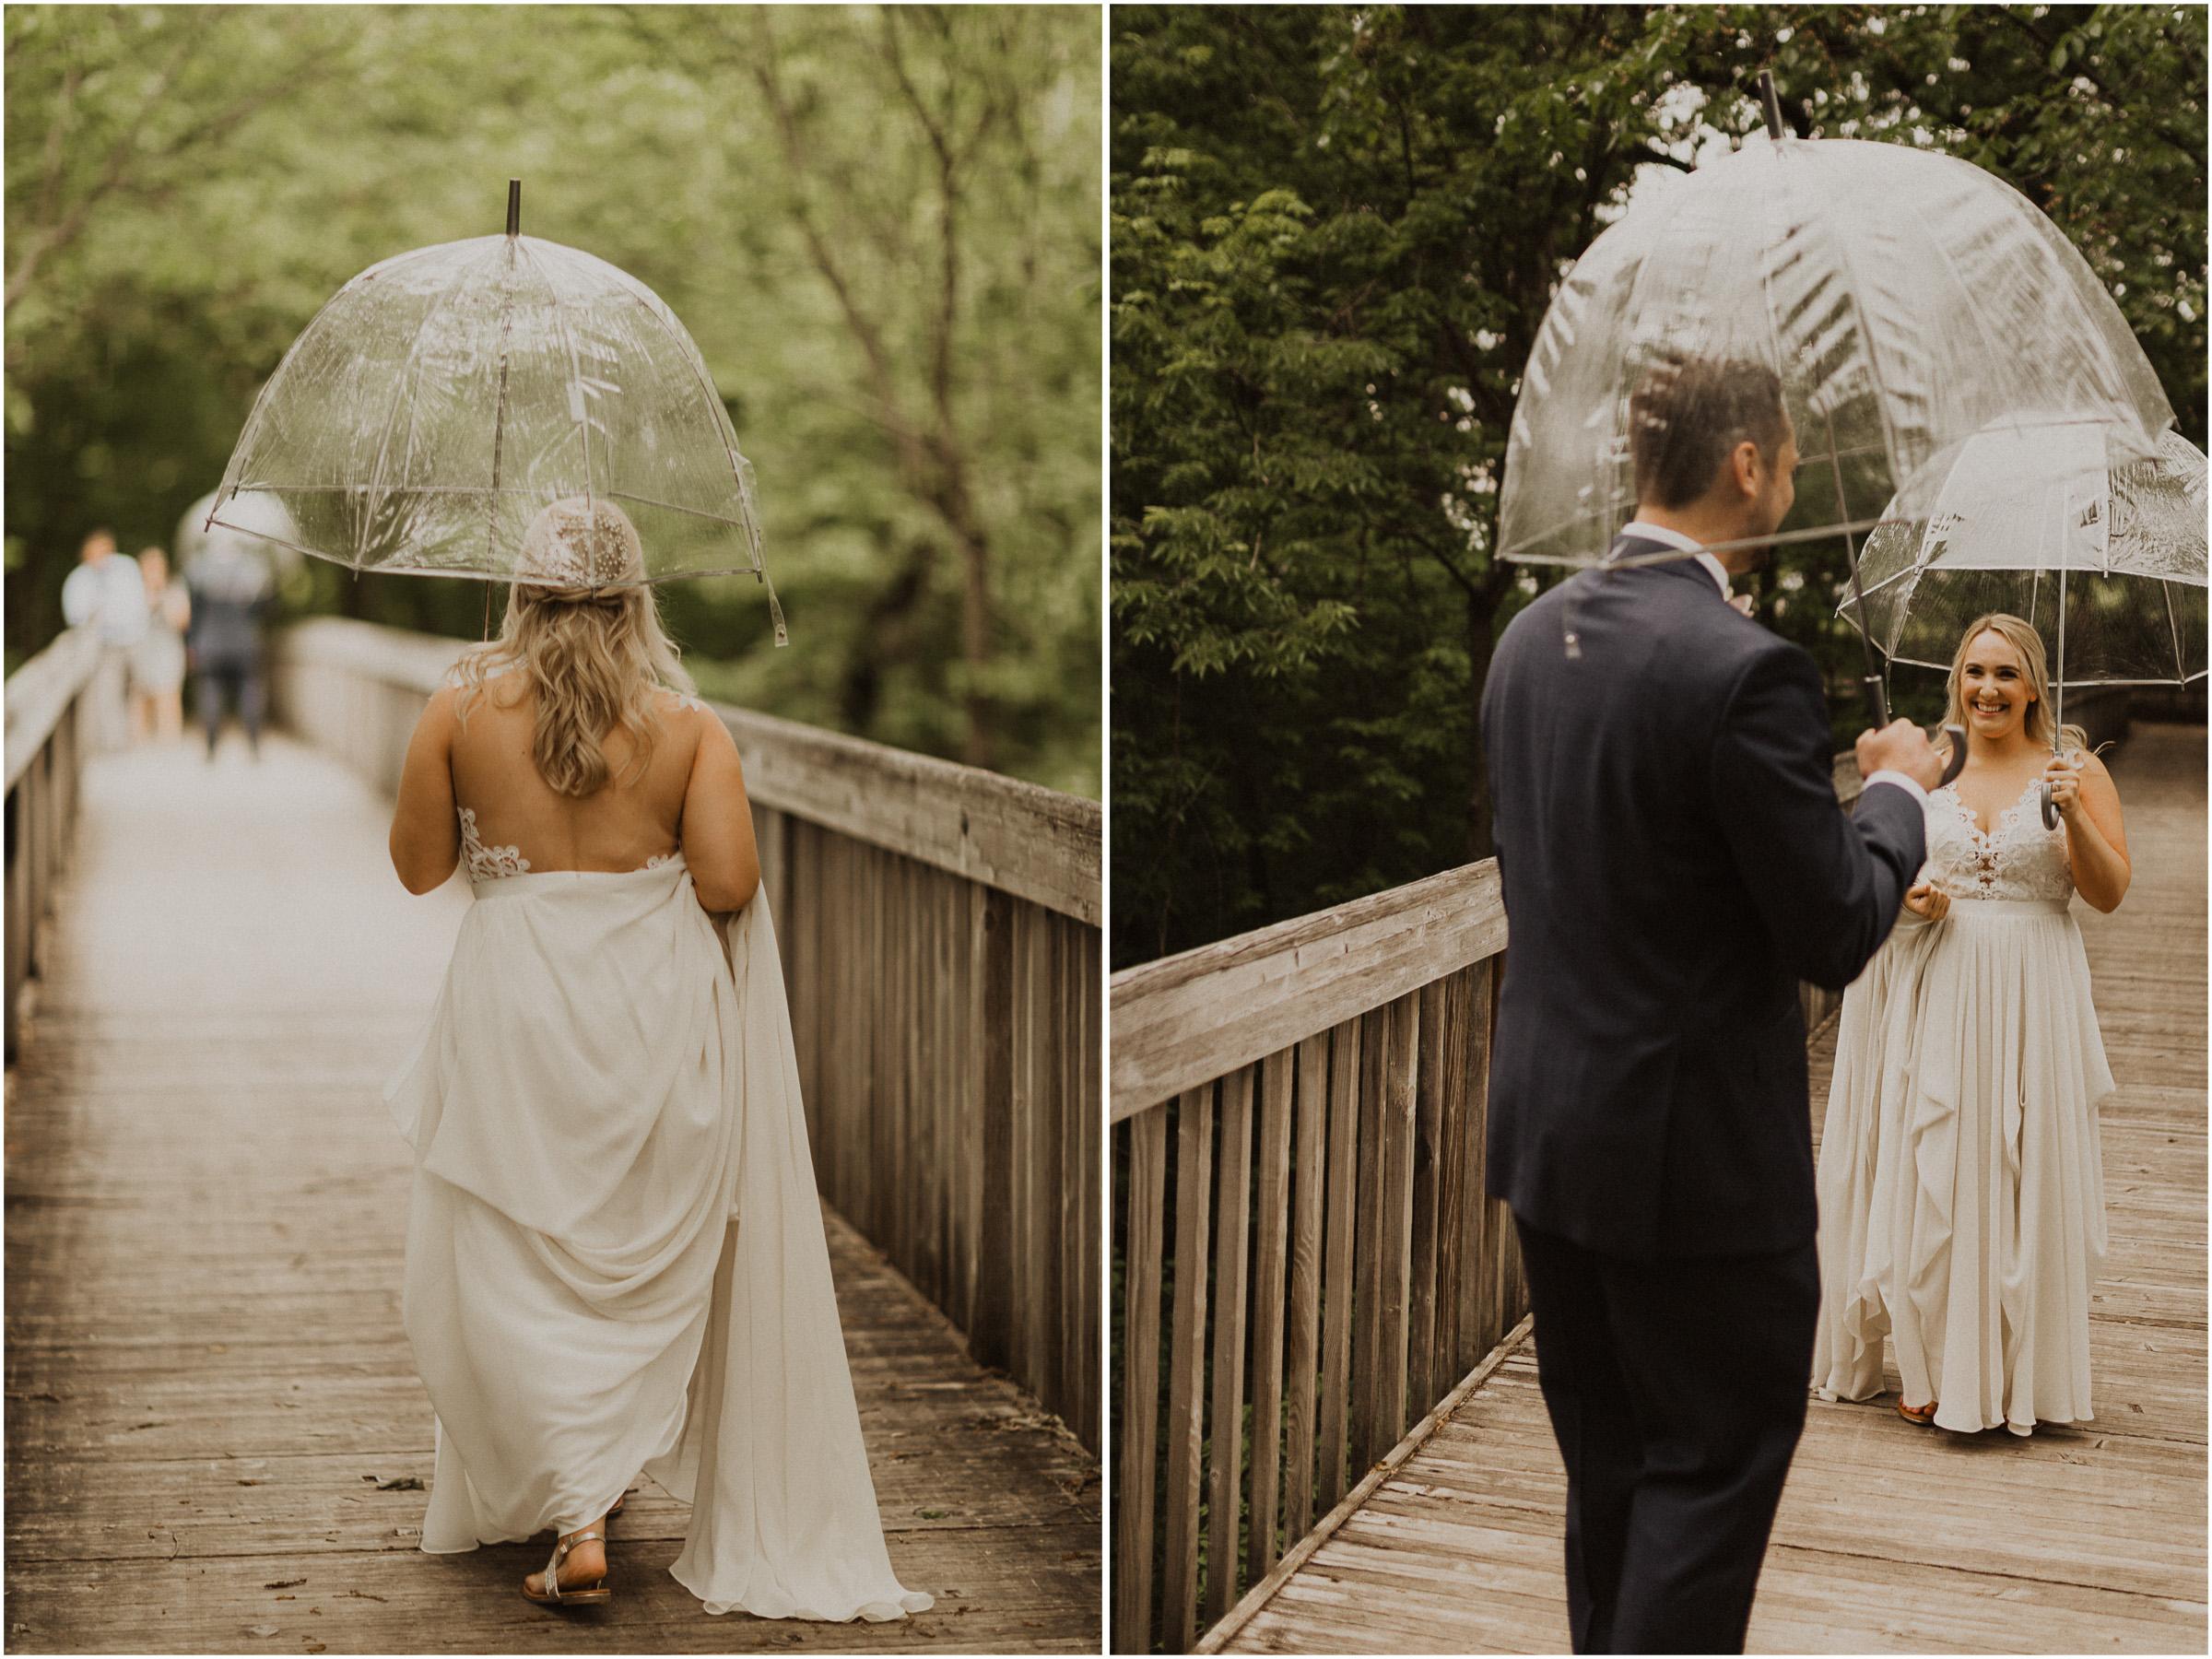 alyssa barletter photography nelson wedding nebraska city lied lodge morton barn spring wedding photographer-7.jpg